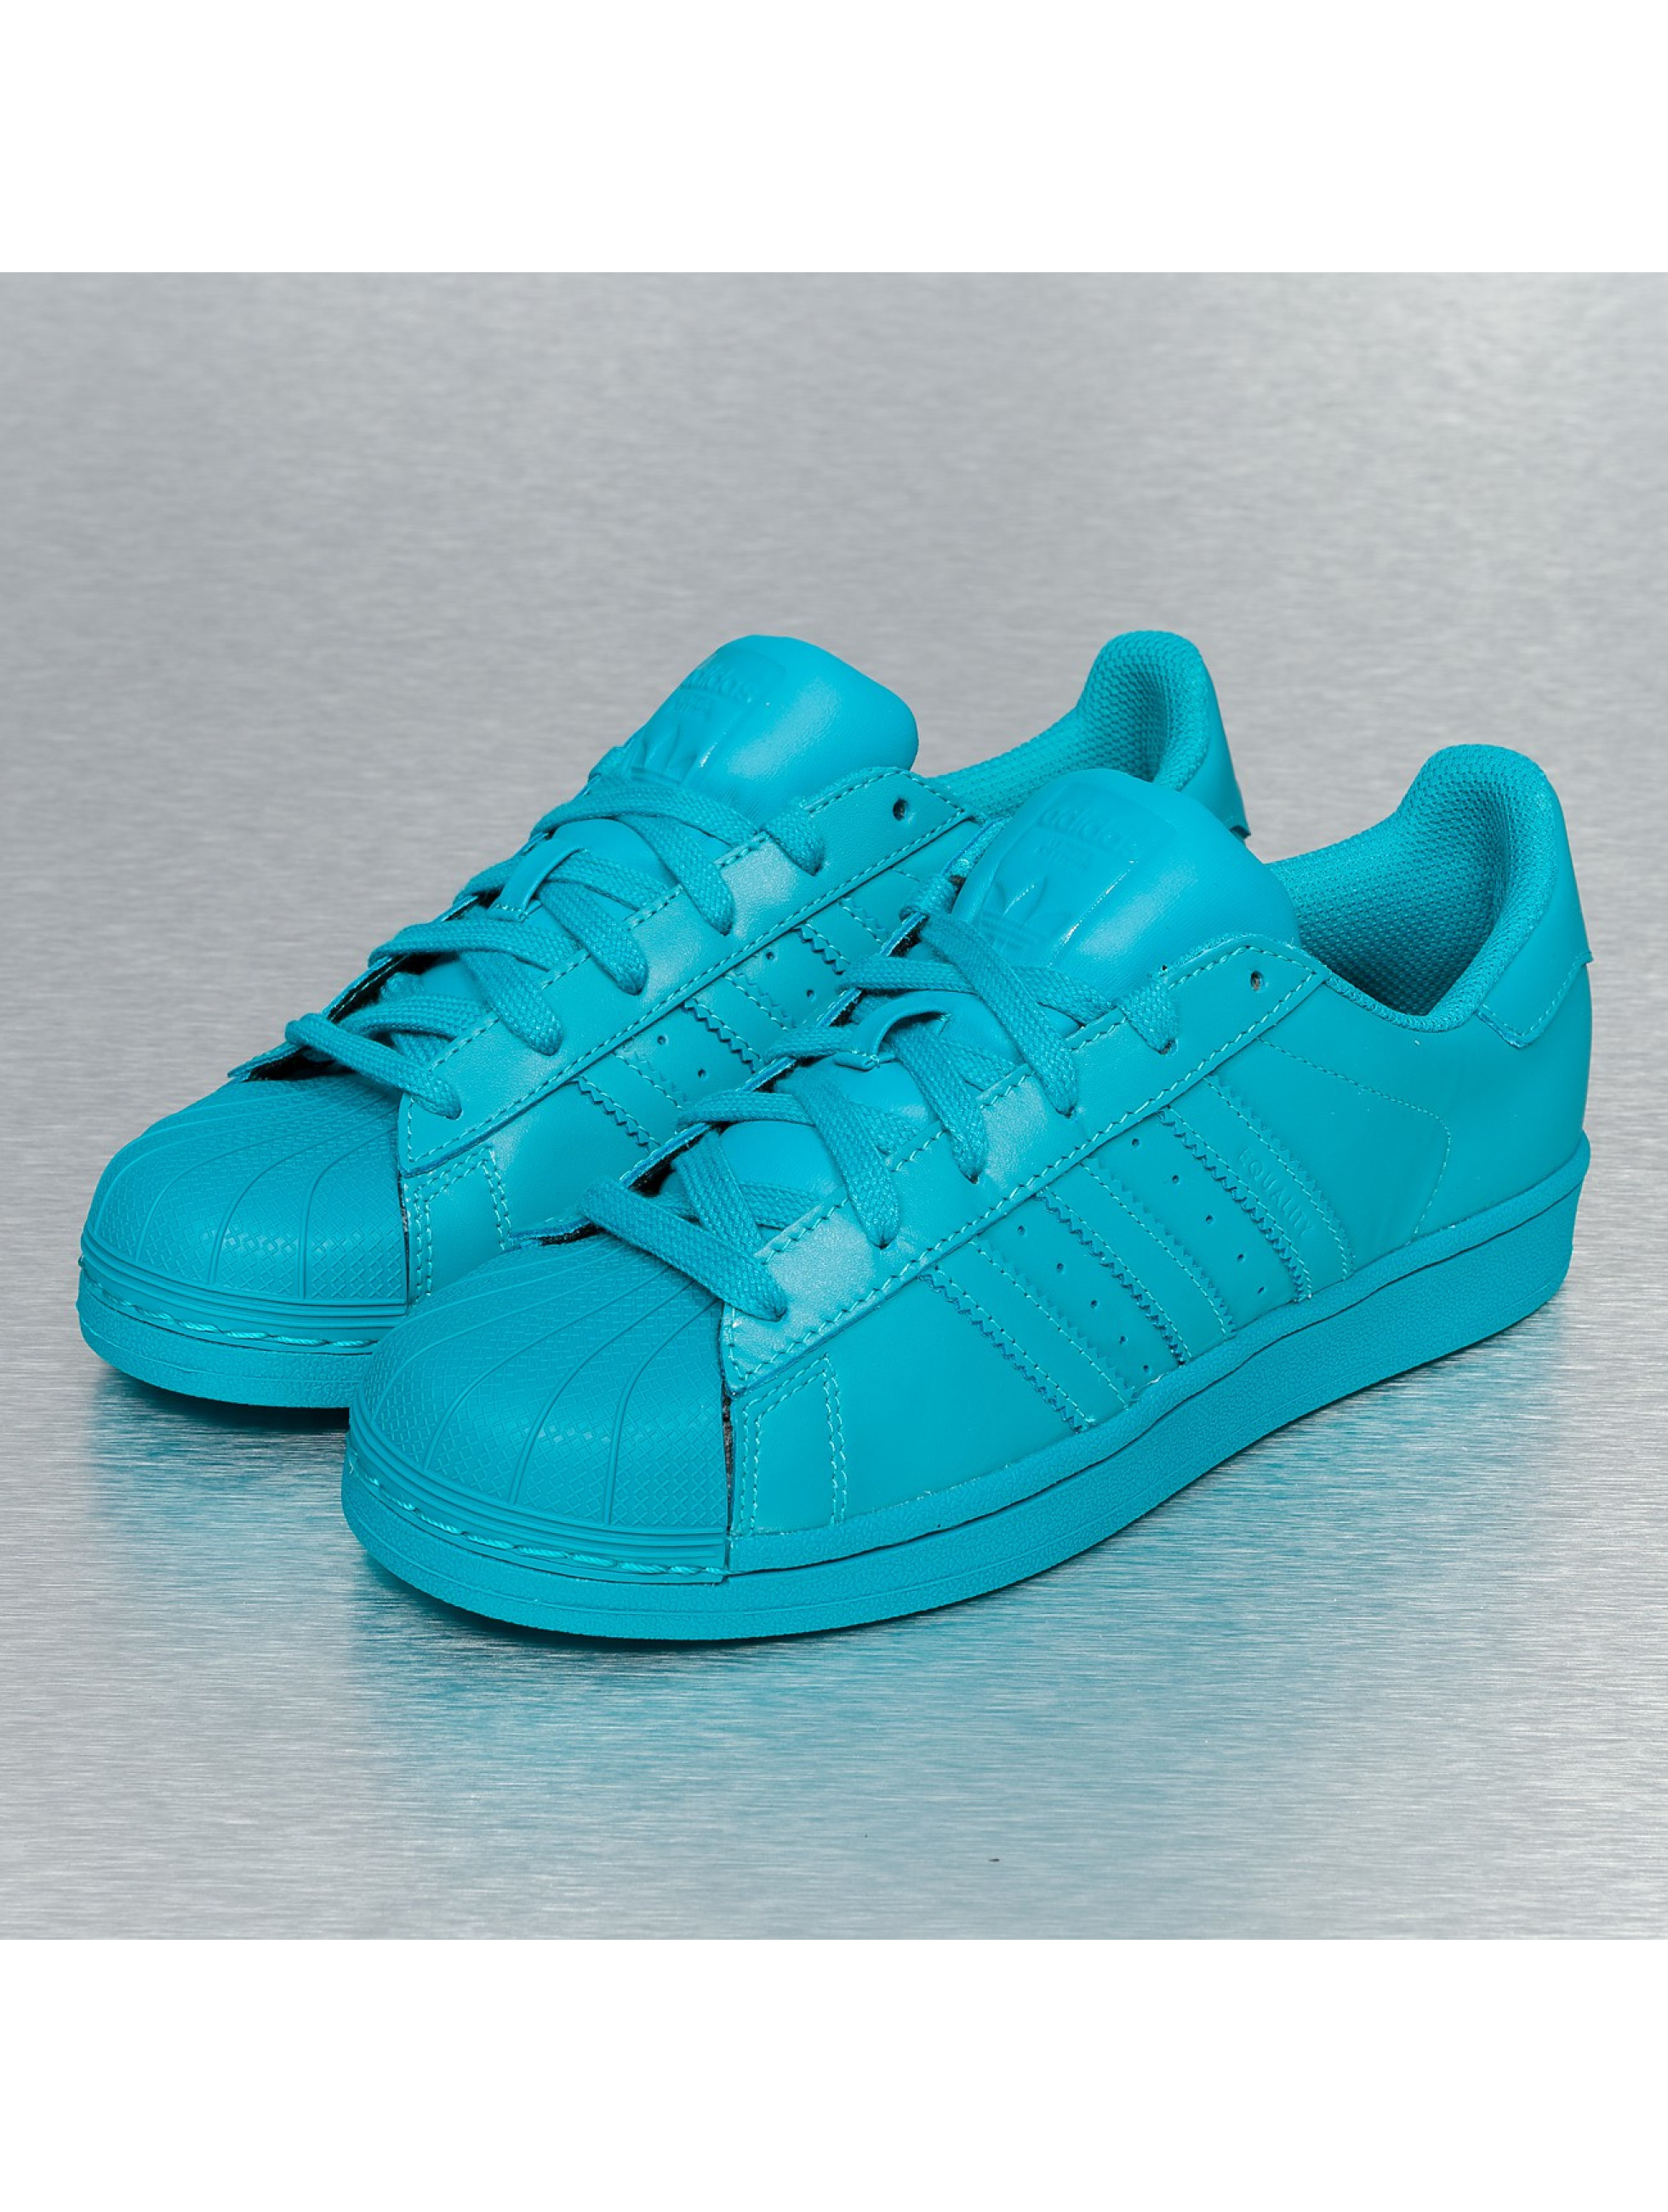 adidas superstar bleu turquoise